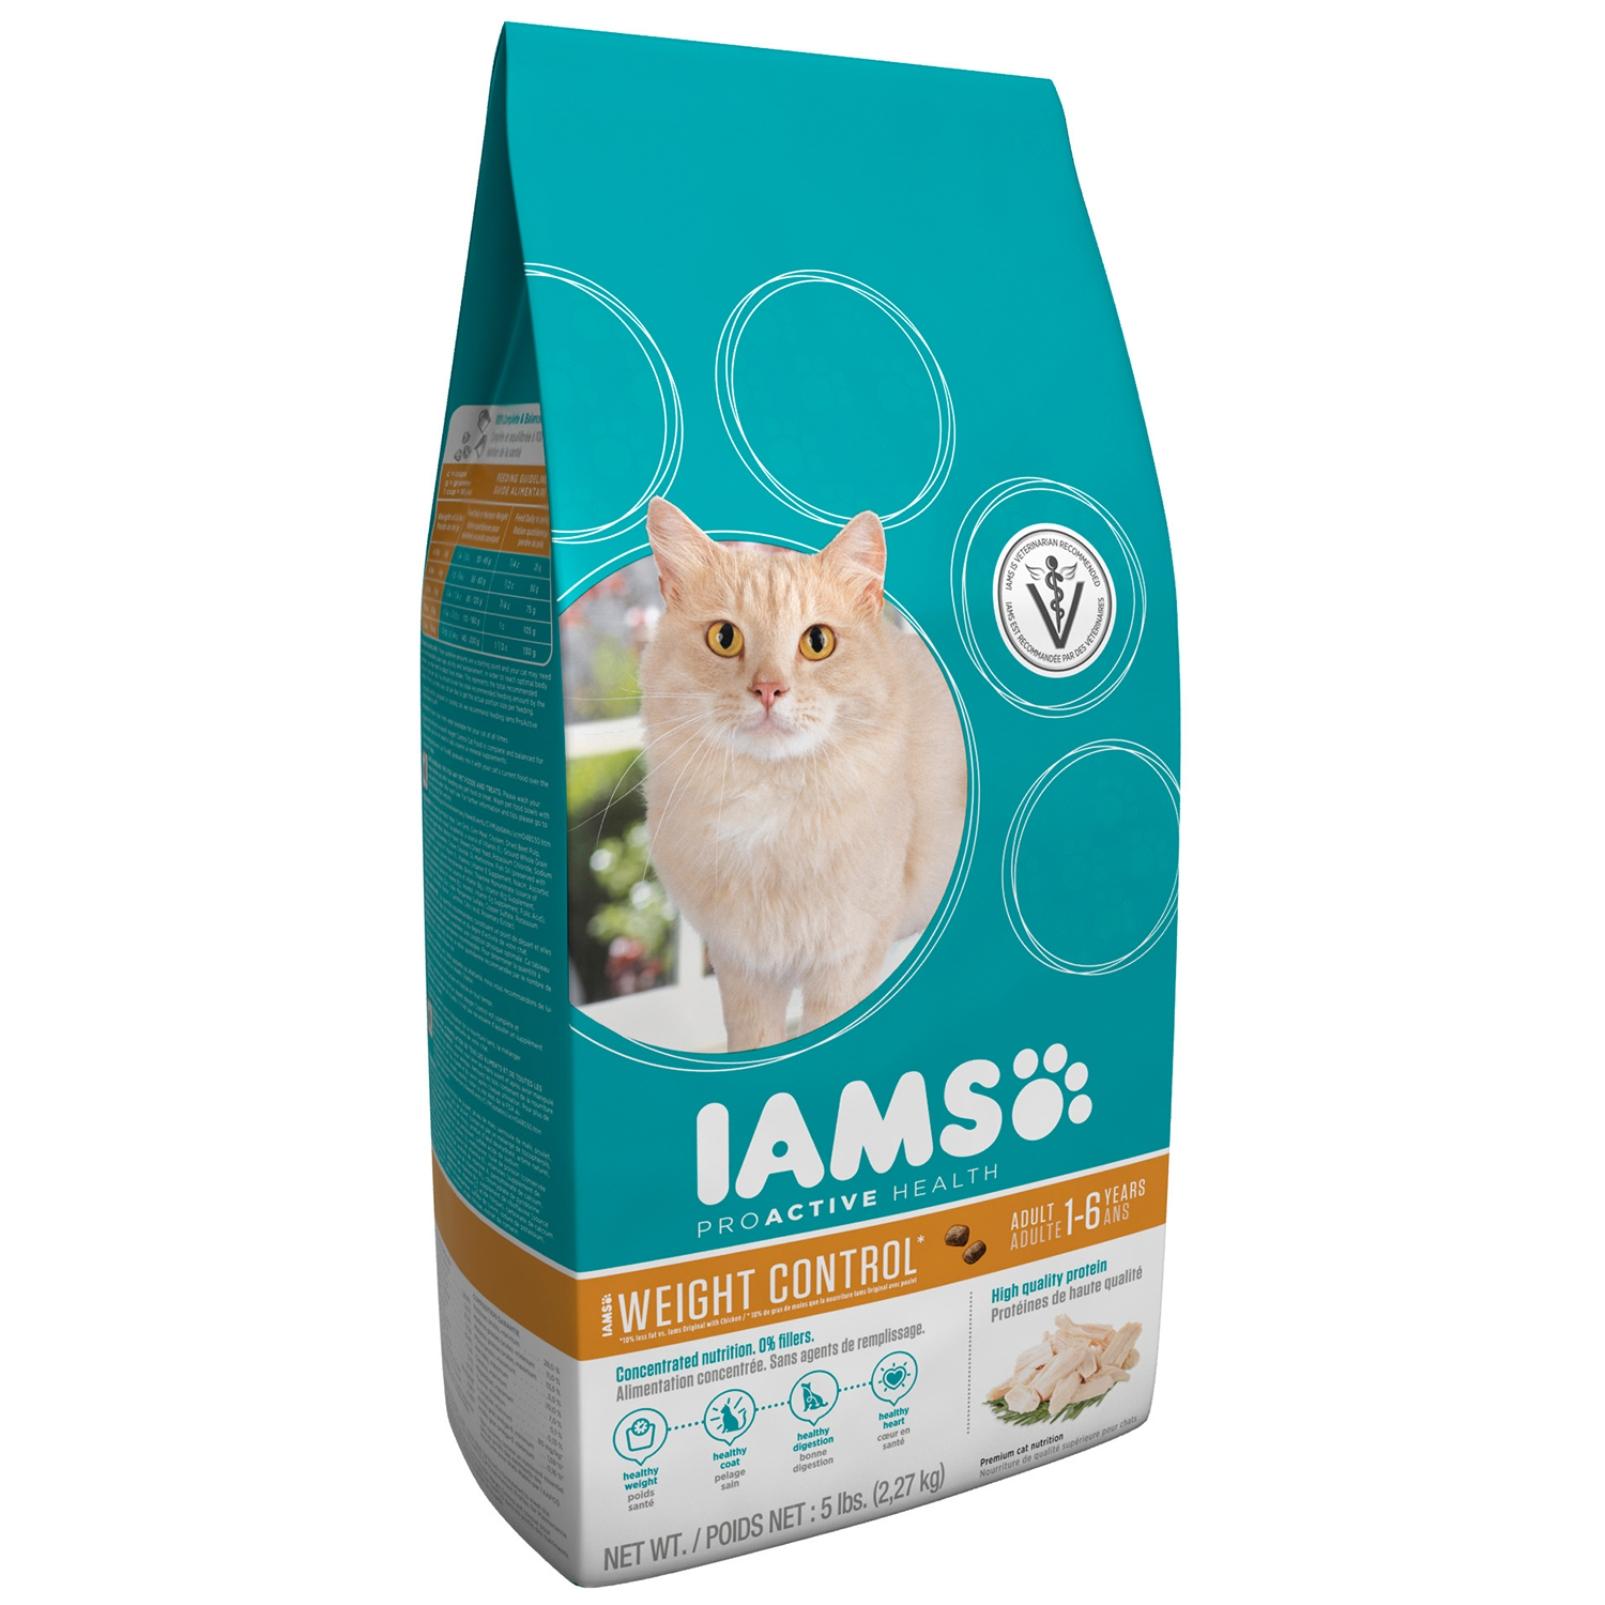 Iams Proactive Health Weight Control Cat Food